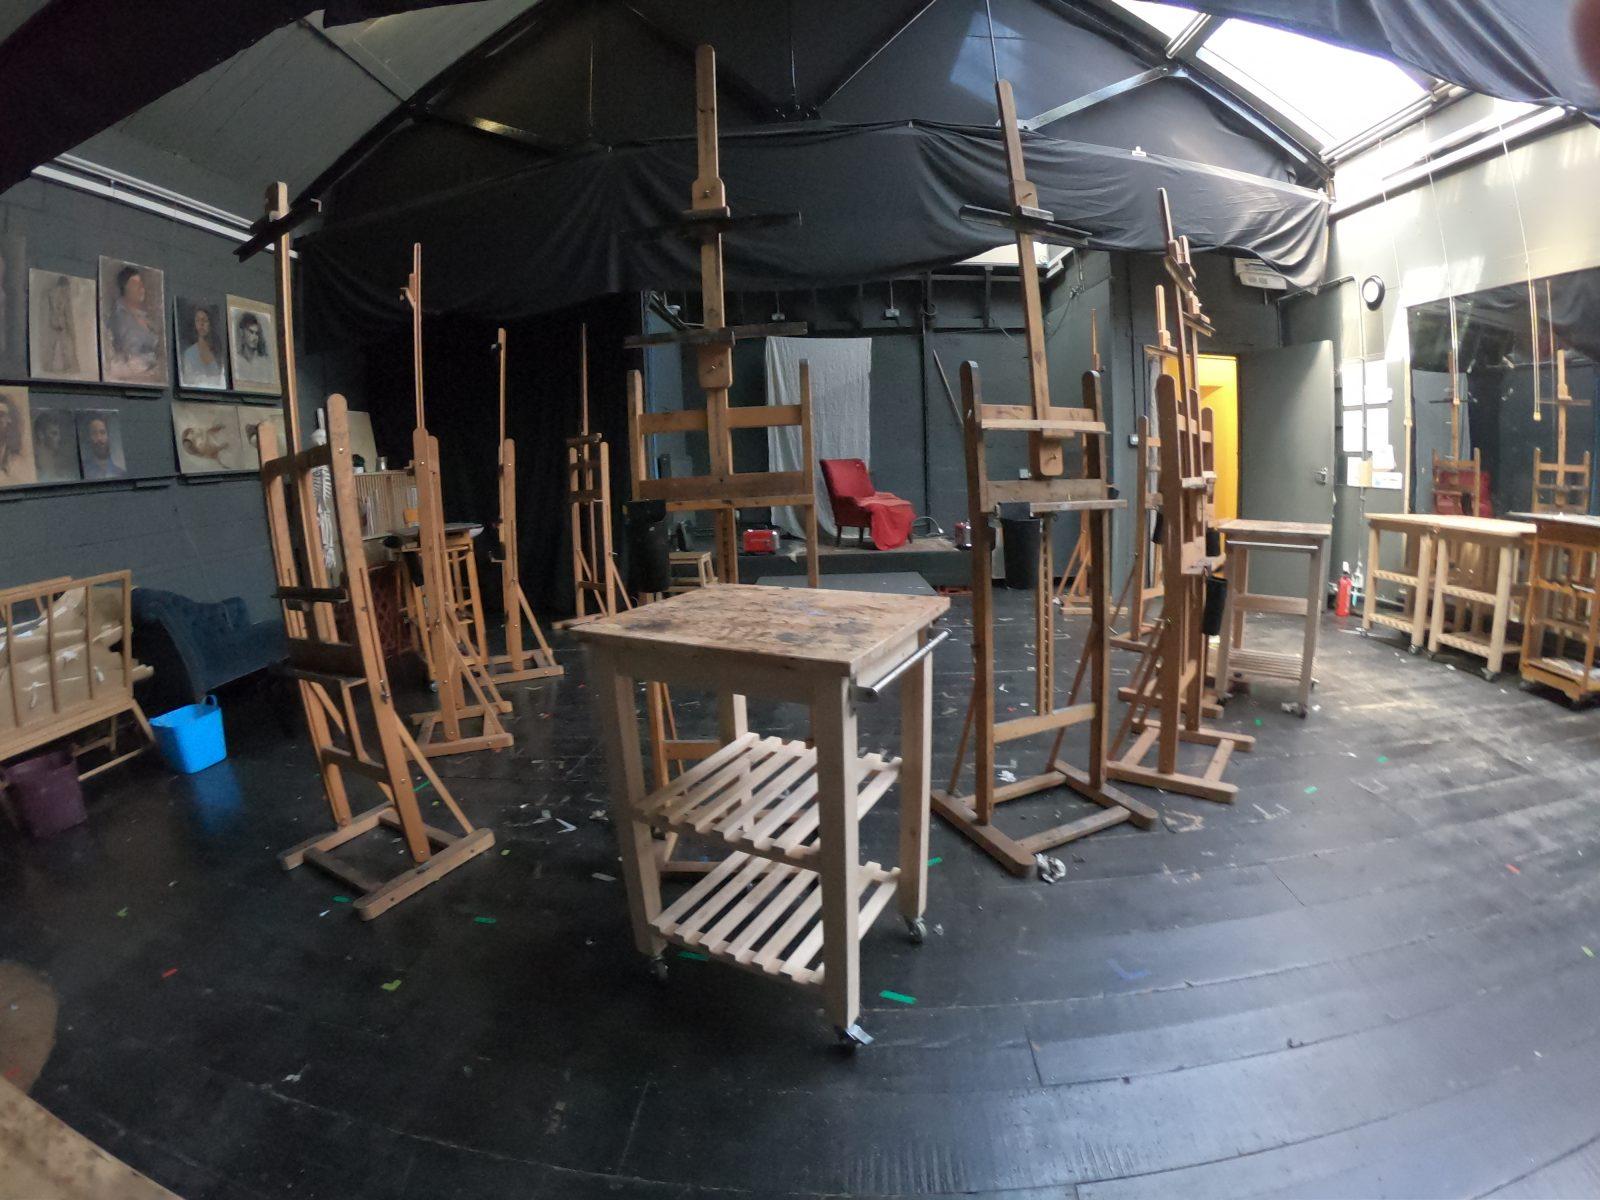 london fine art studios, visiting artists, international artists, art studio, london art studio, london fine art studio, london art, art classes, artists, fine artist, art workshops, oil on canvas, arted, artsed, ArtTeacher, ArtEducation, moreARTnotless, art studio